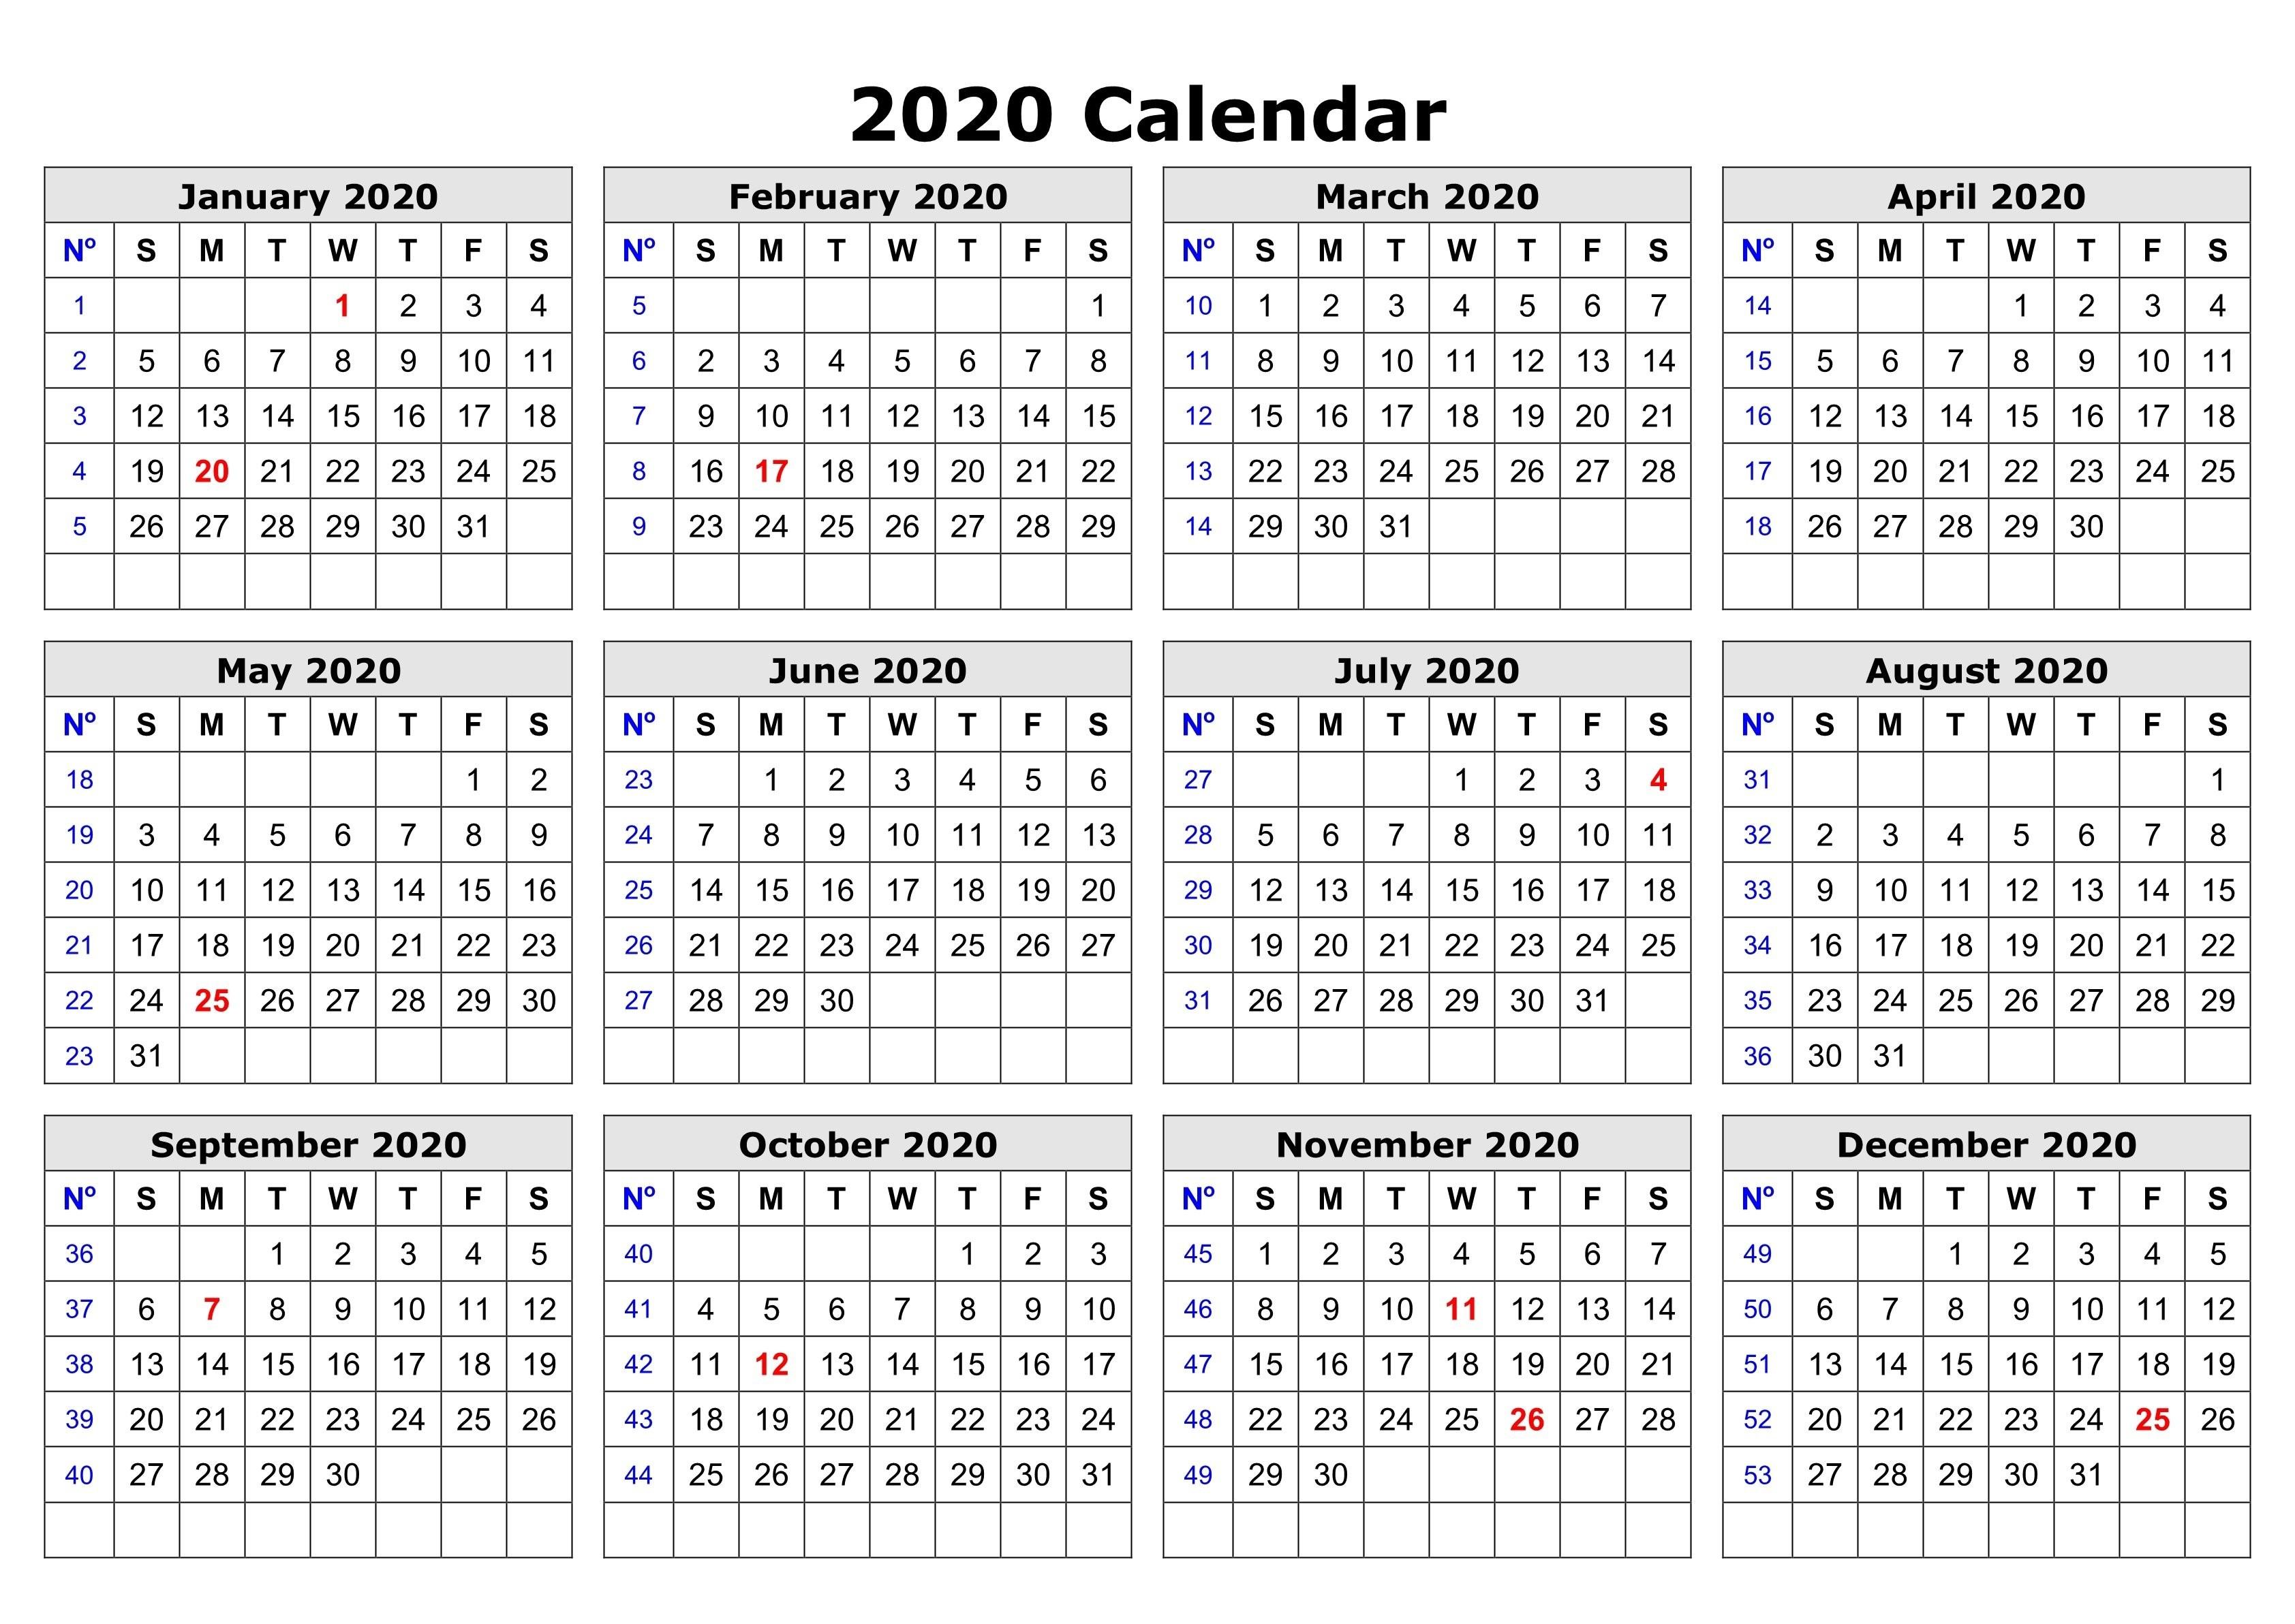 Printable 2020 Calendar by Month 2020 E Page Calendar Printable